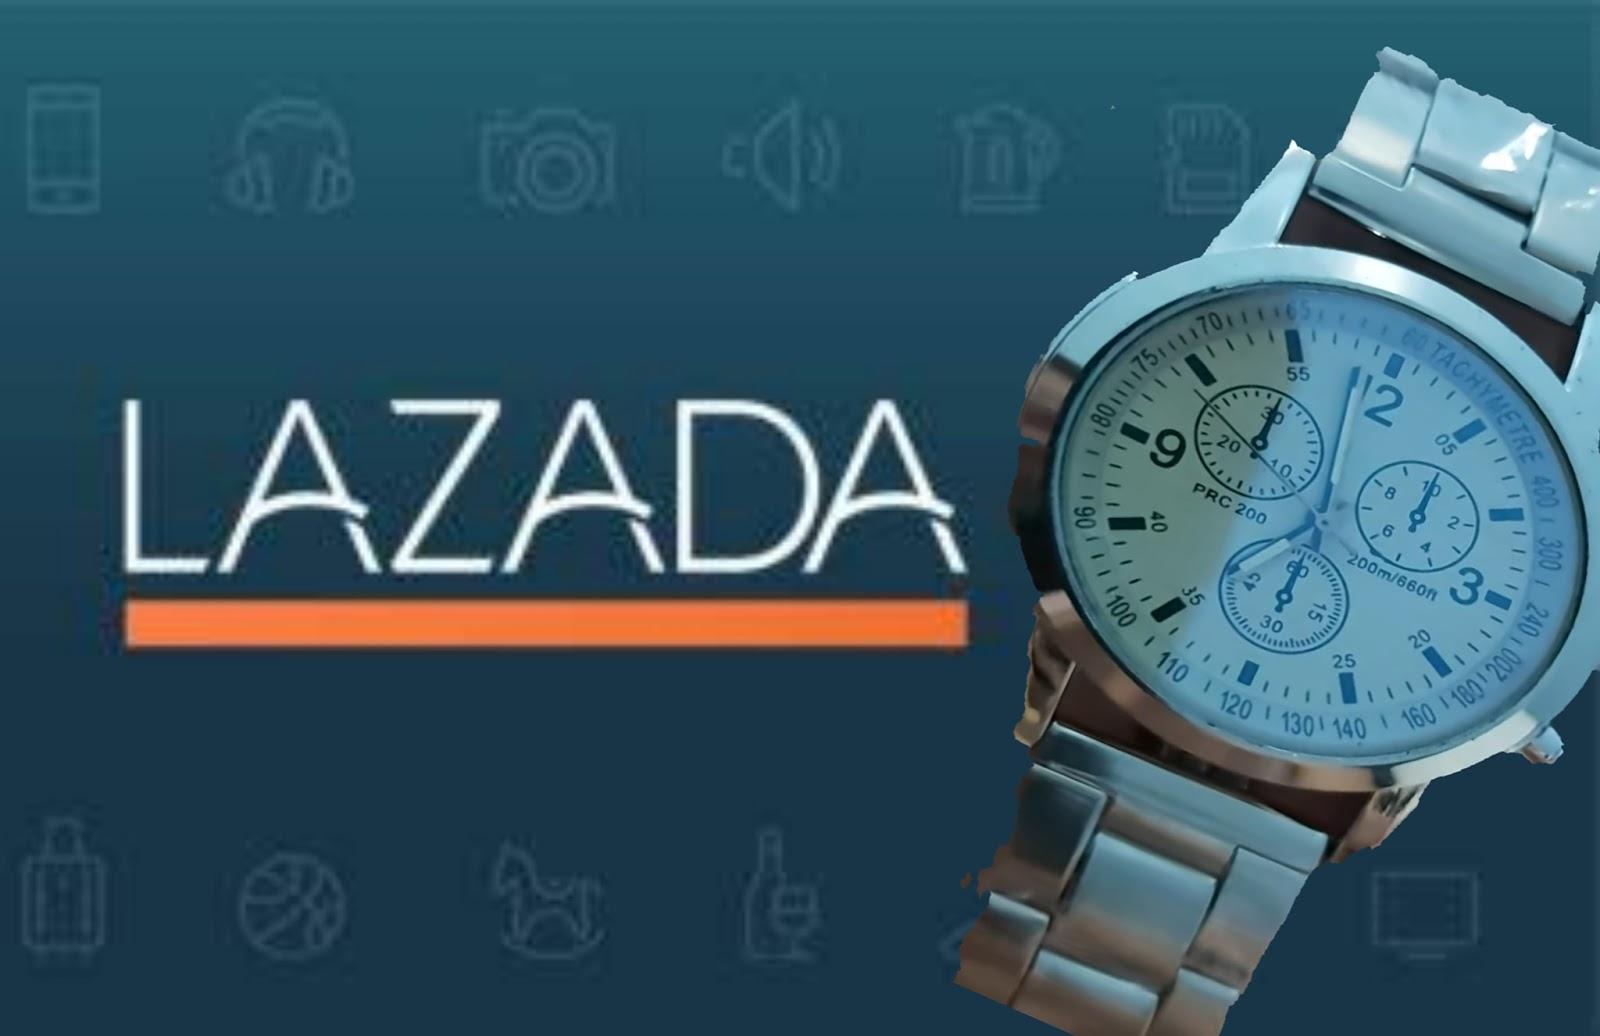 lazada, time machine